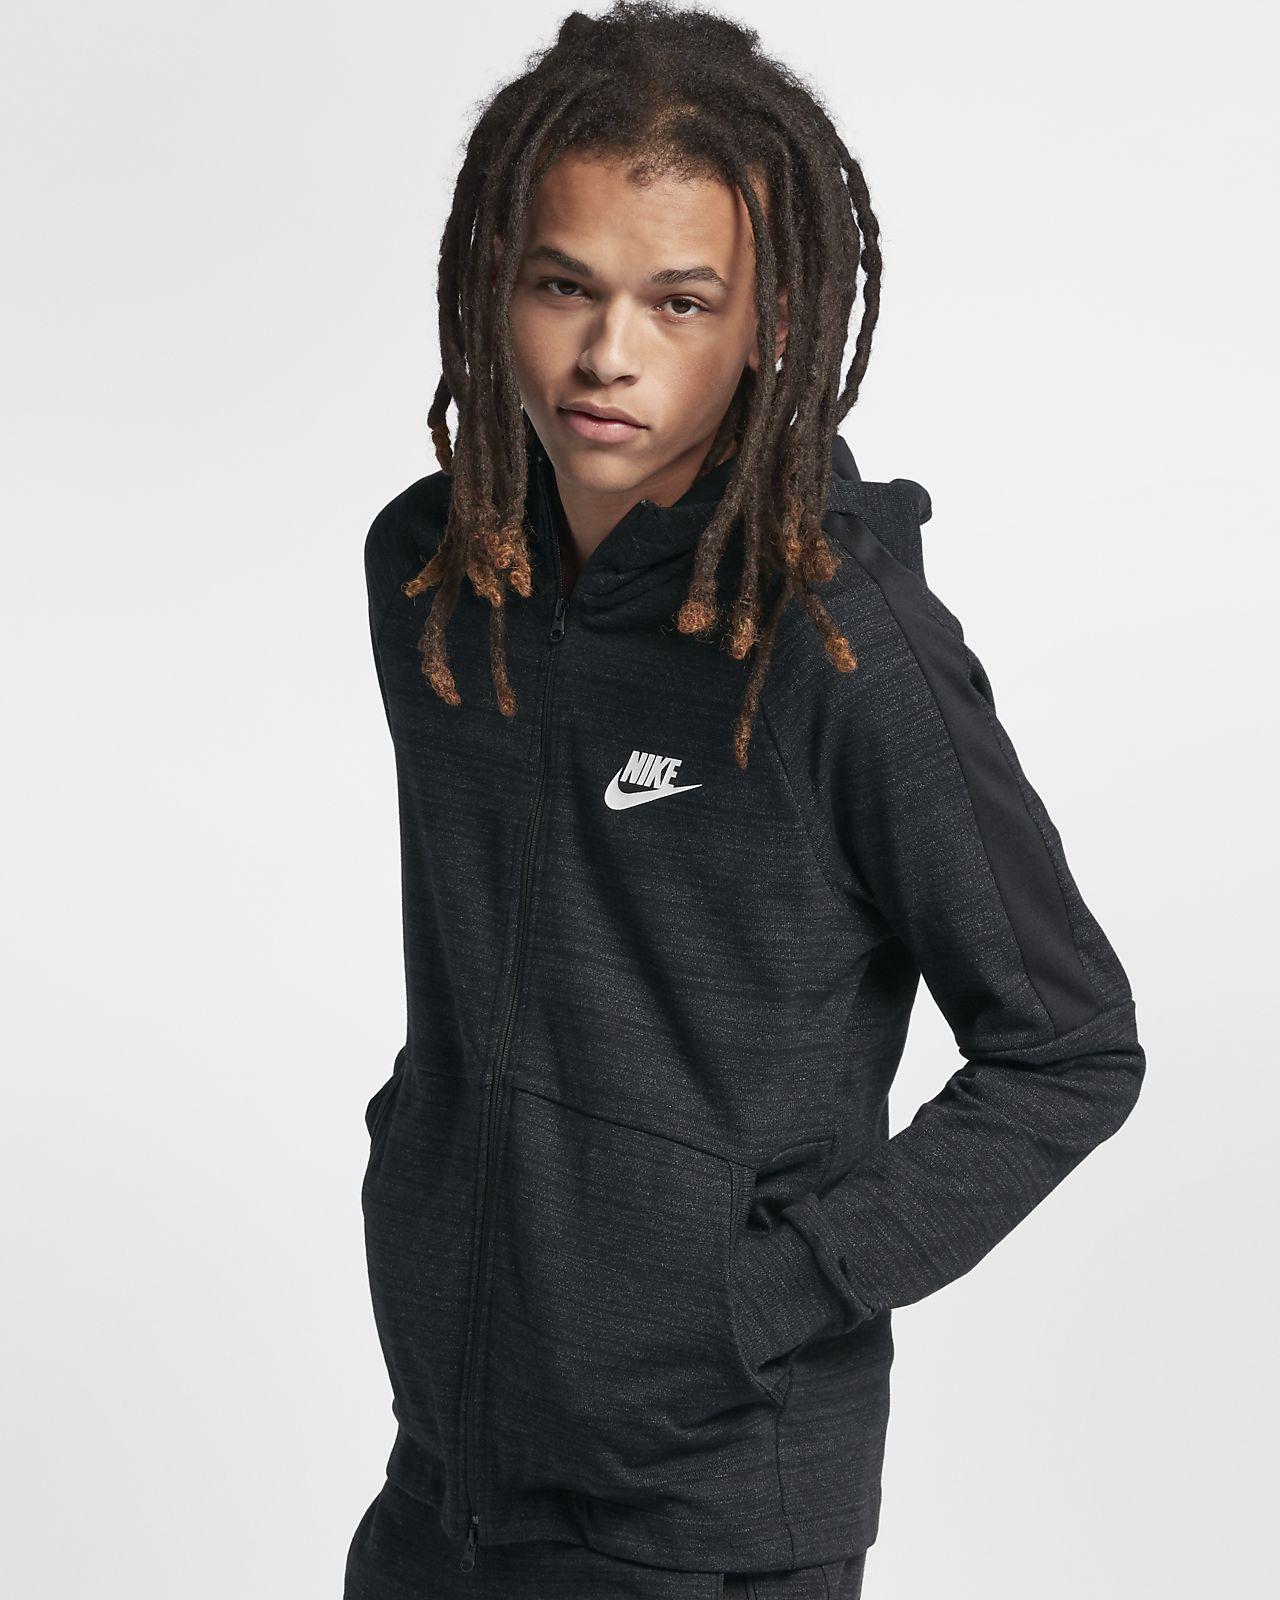 dc6d3f0aa6a6 Męska rozpinana bluza z kapturem Nike Sportswear Advance 15. Nike.com PL